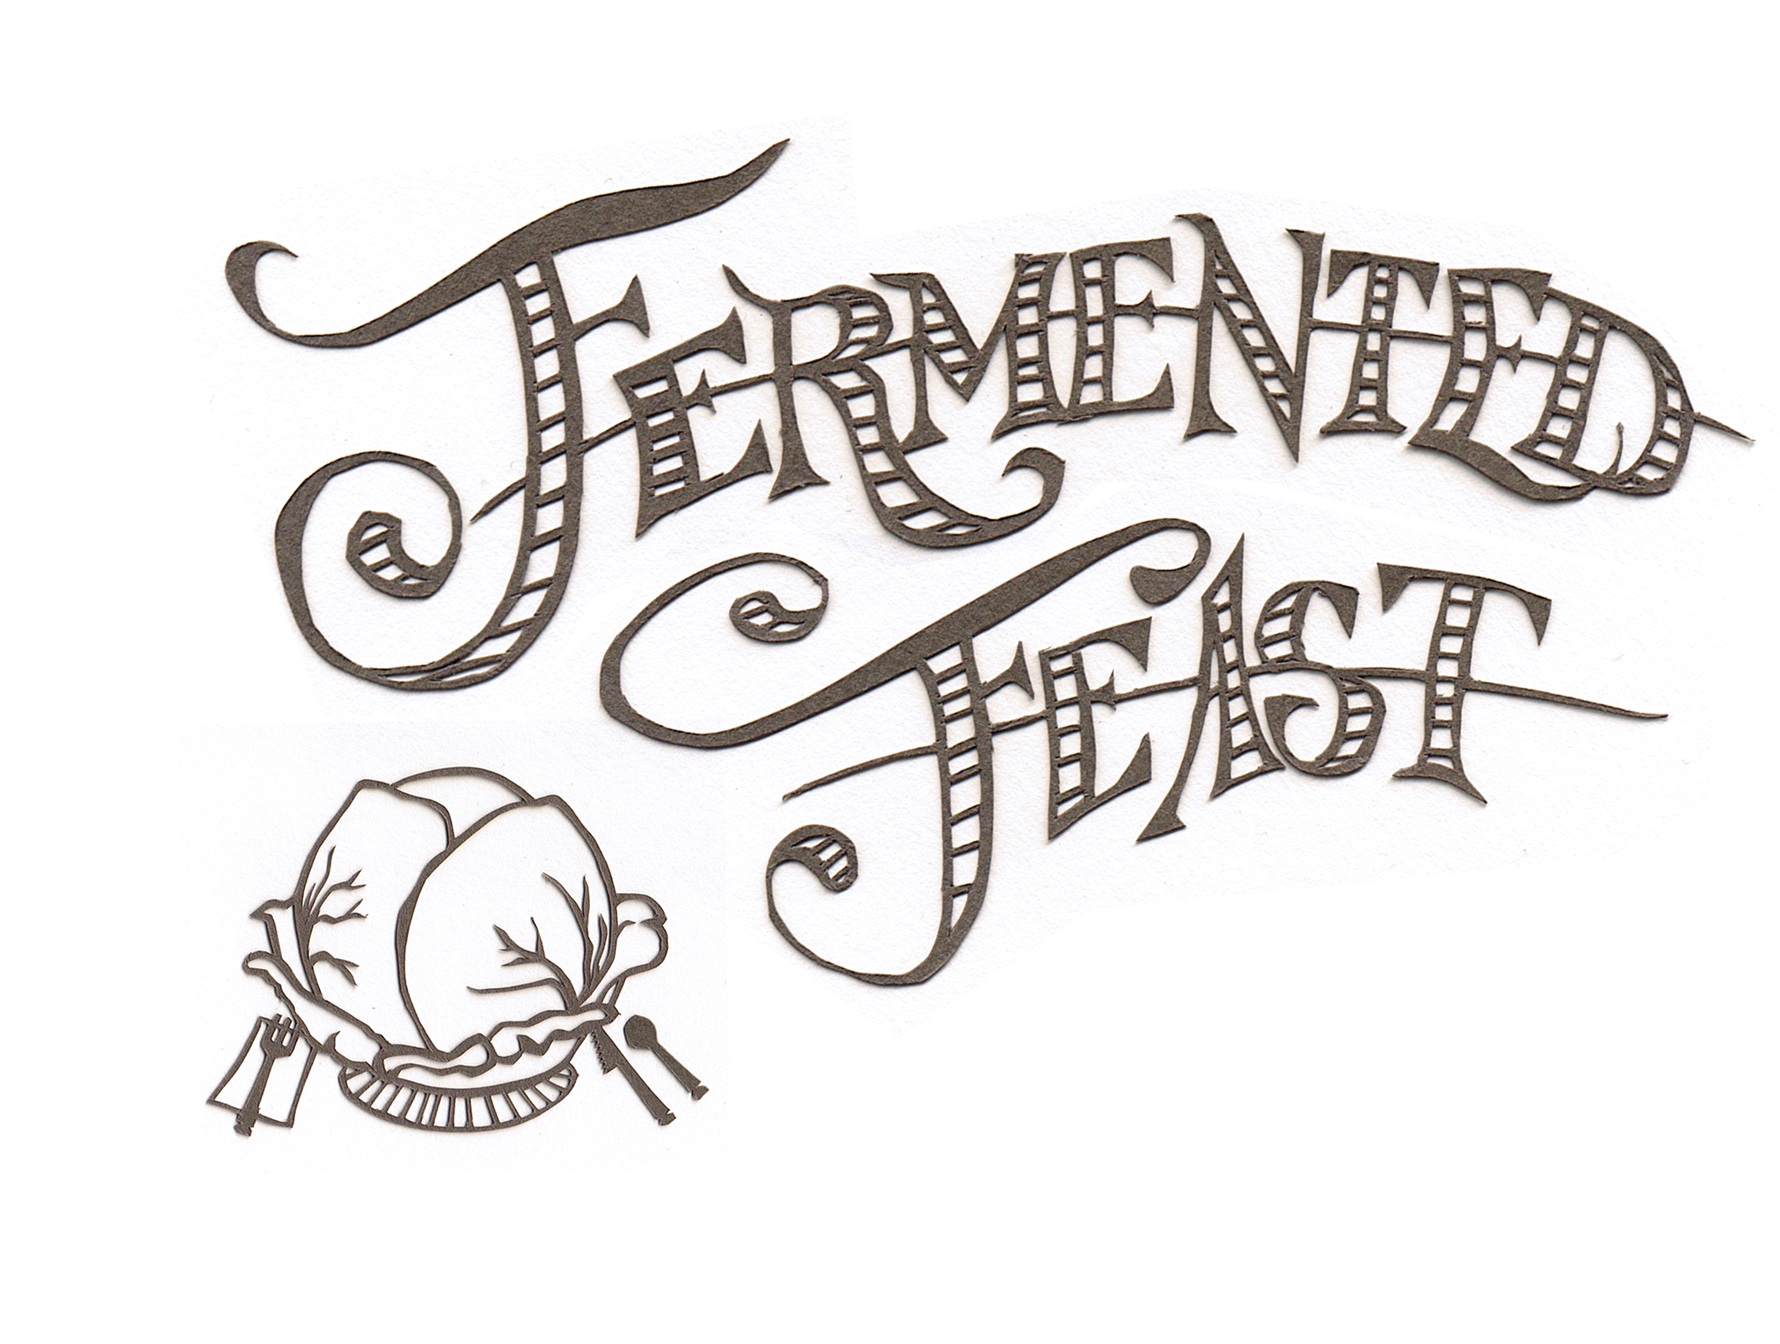 Fermented_logotype_2.jpg